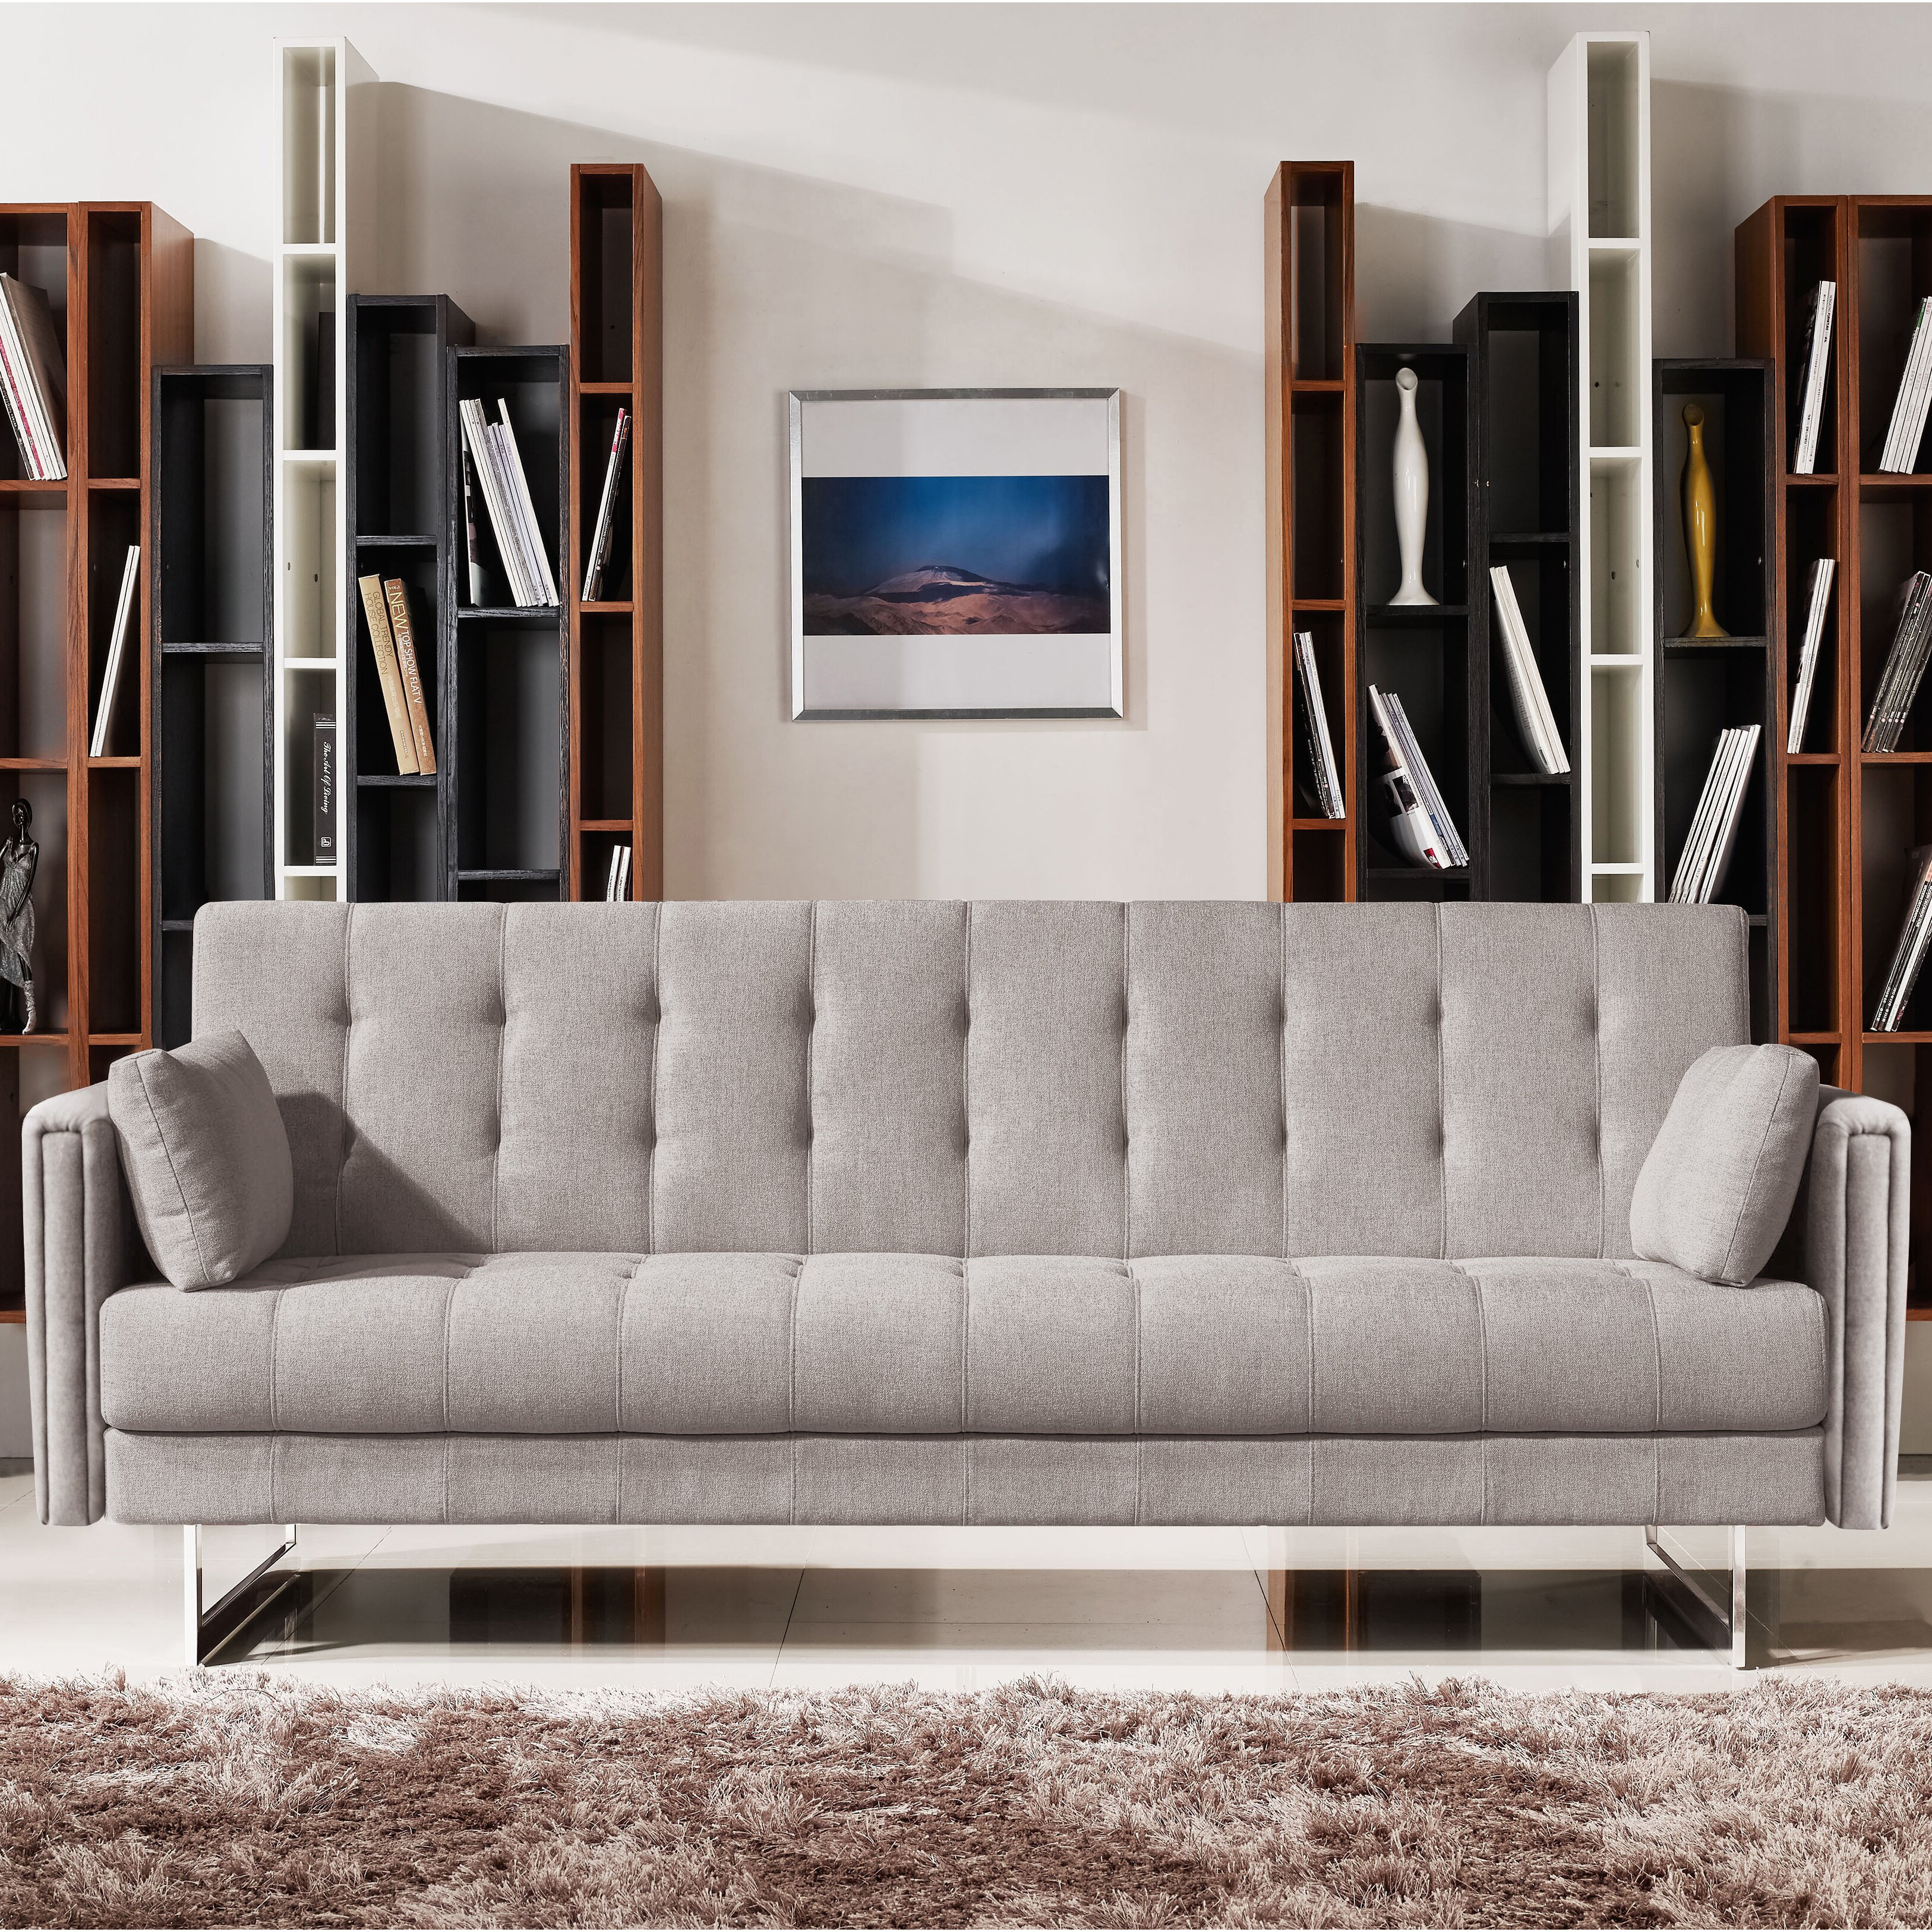 Vig furniture divani casa tejon sleeper sofa reviews for Divani recliner